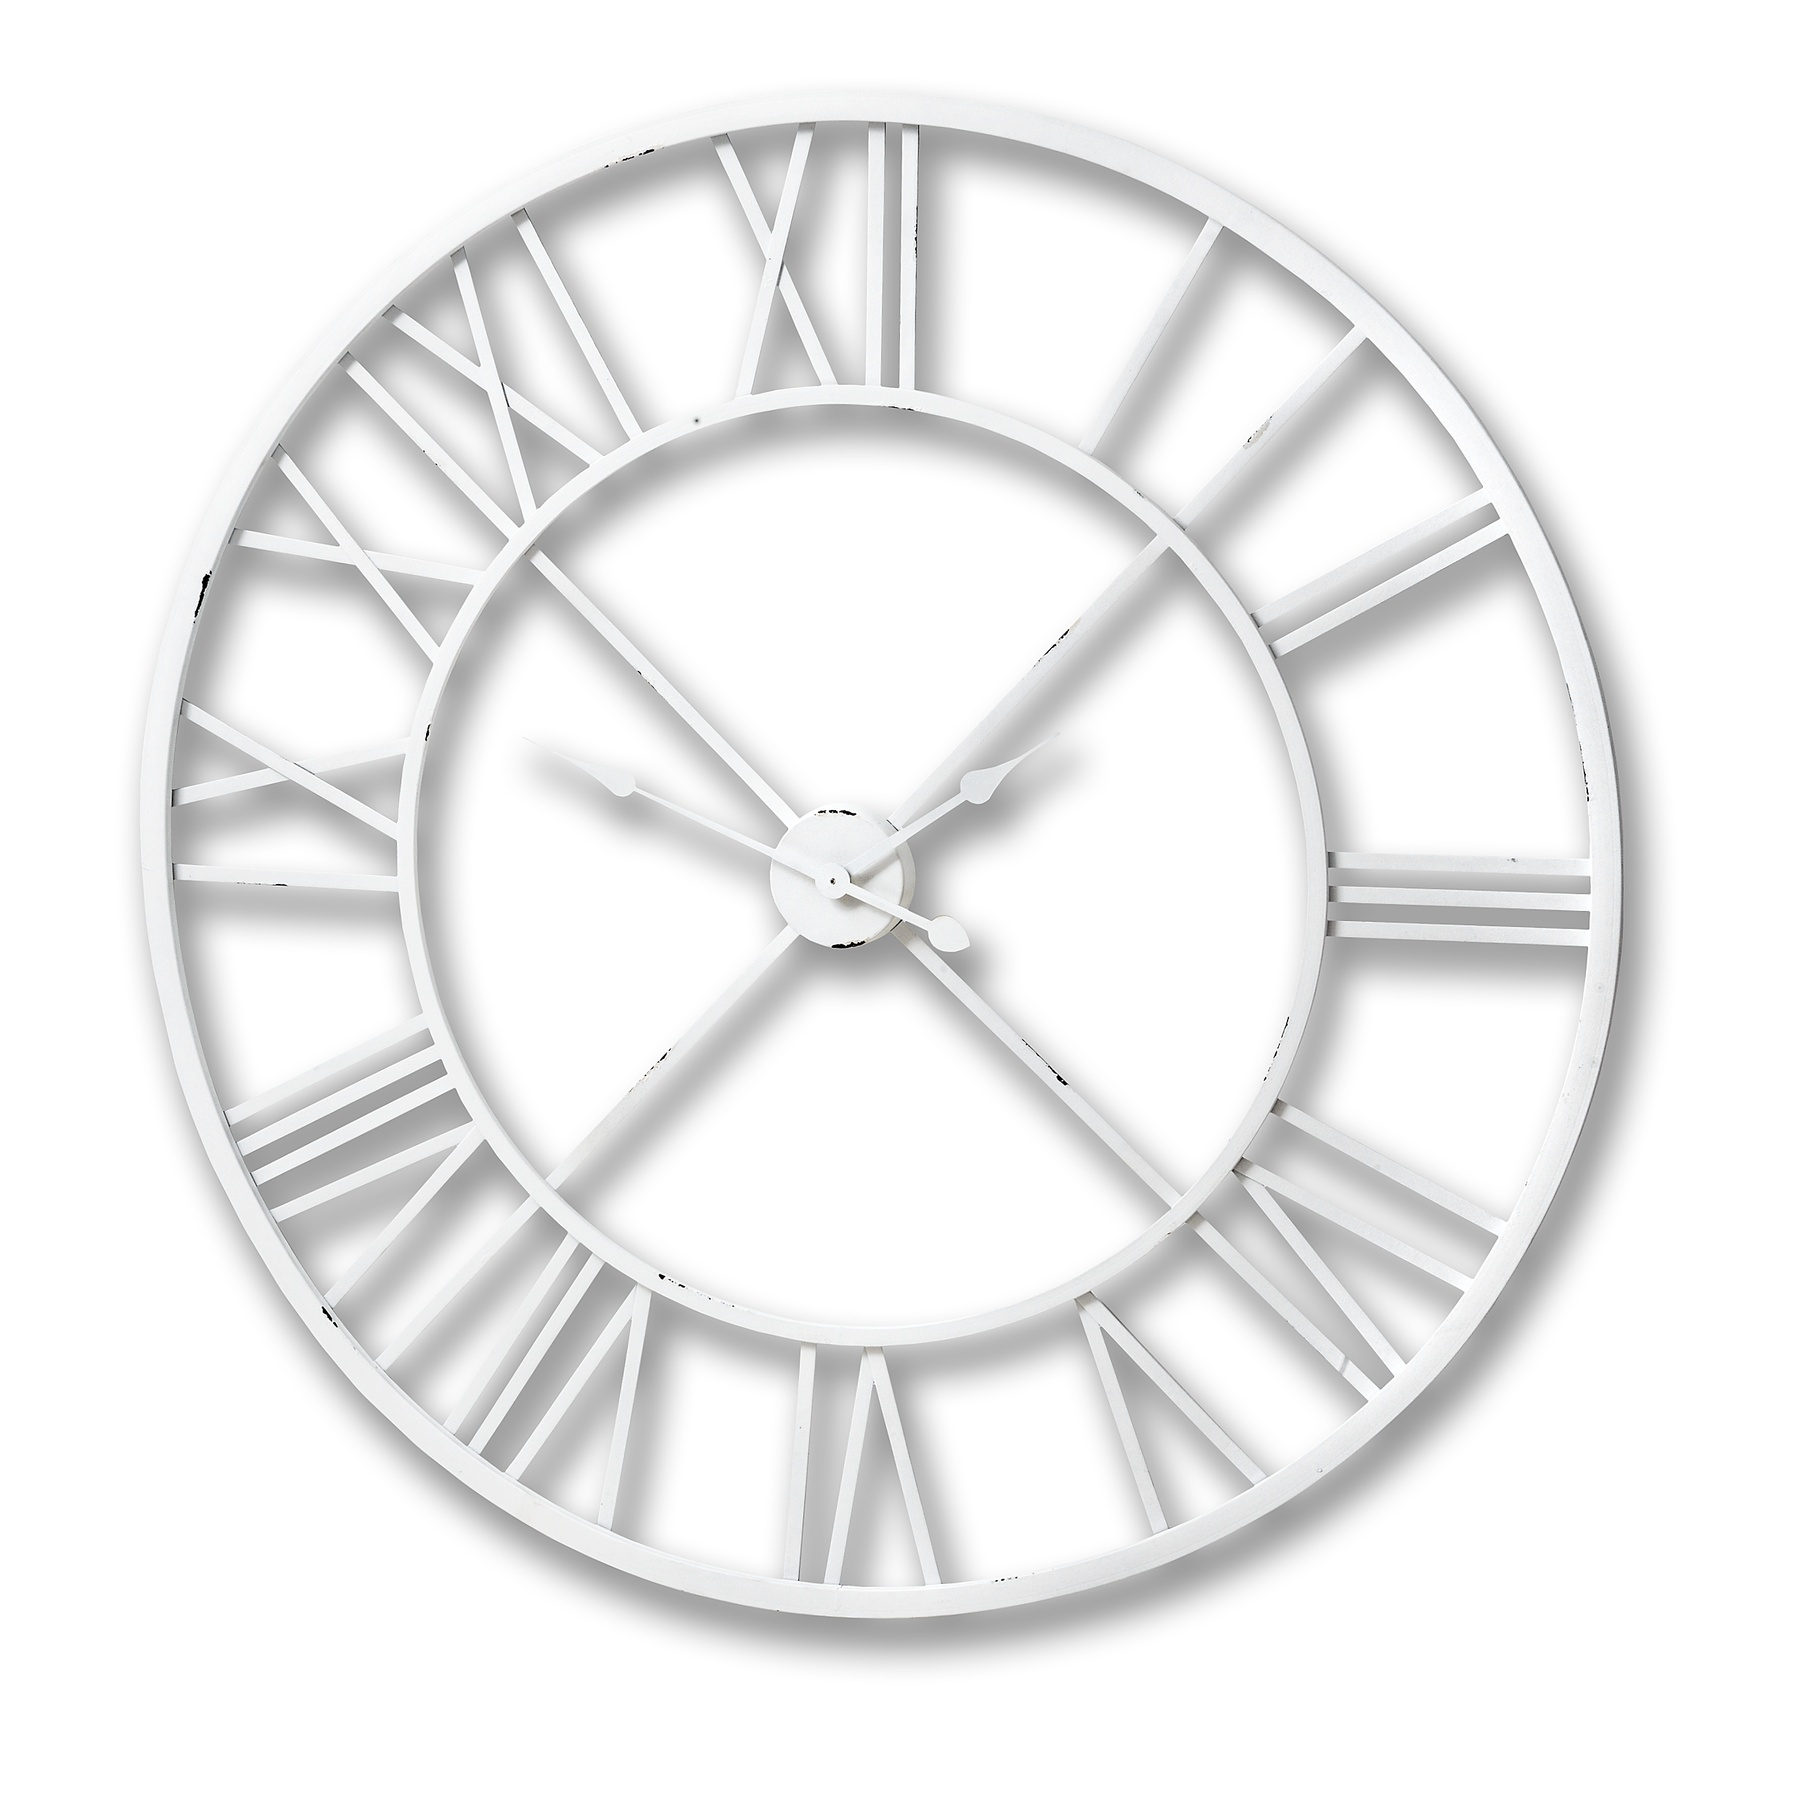 Antique White Roman Numeral Wall Clock